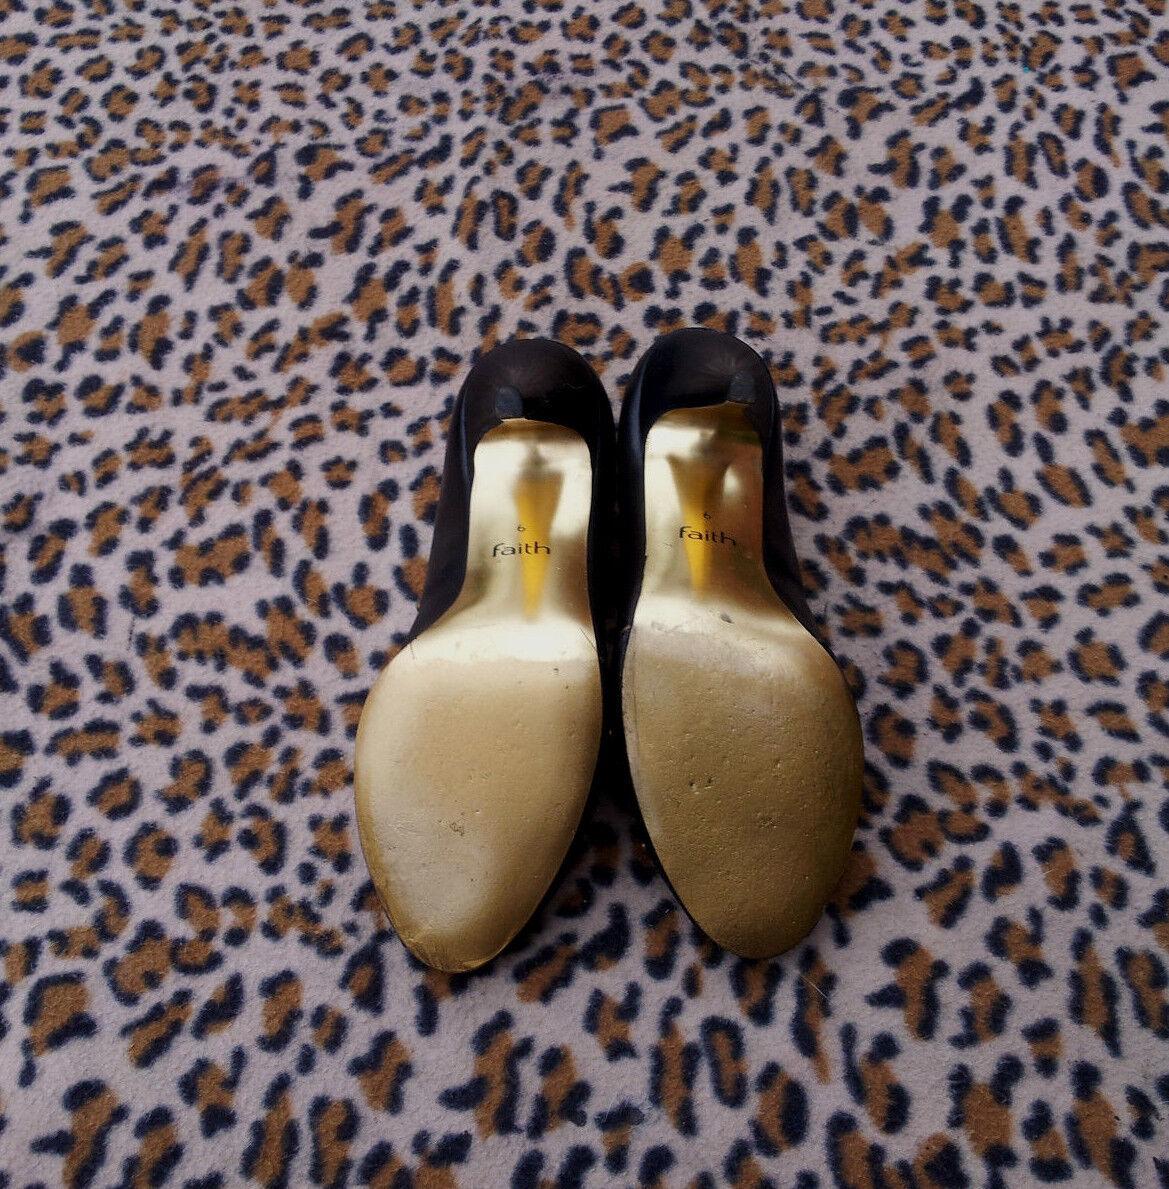 Faith schwarz Leder high heeled heeled heeled peep toe schuhe UK Größe 6 EU Größe 39 5cb667